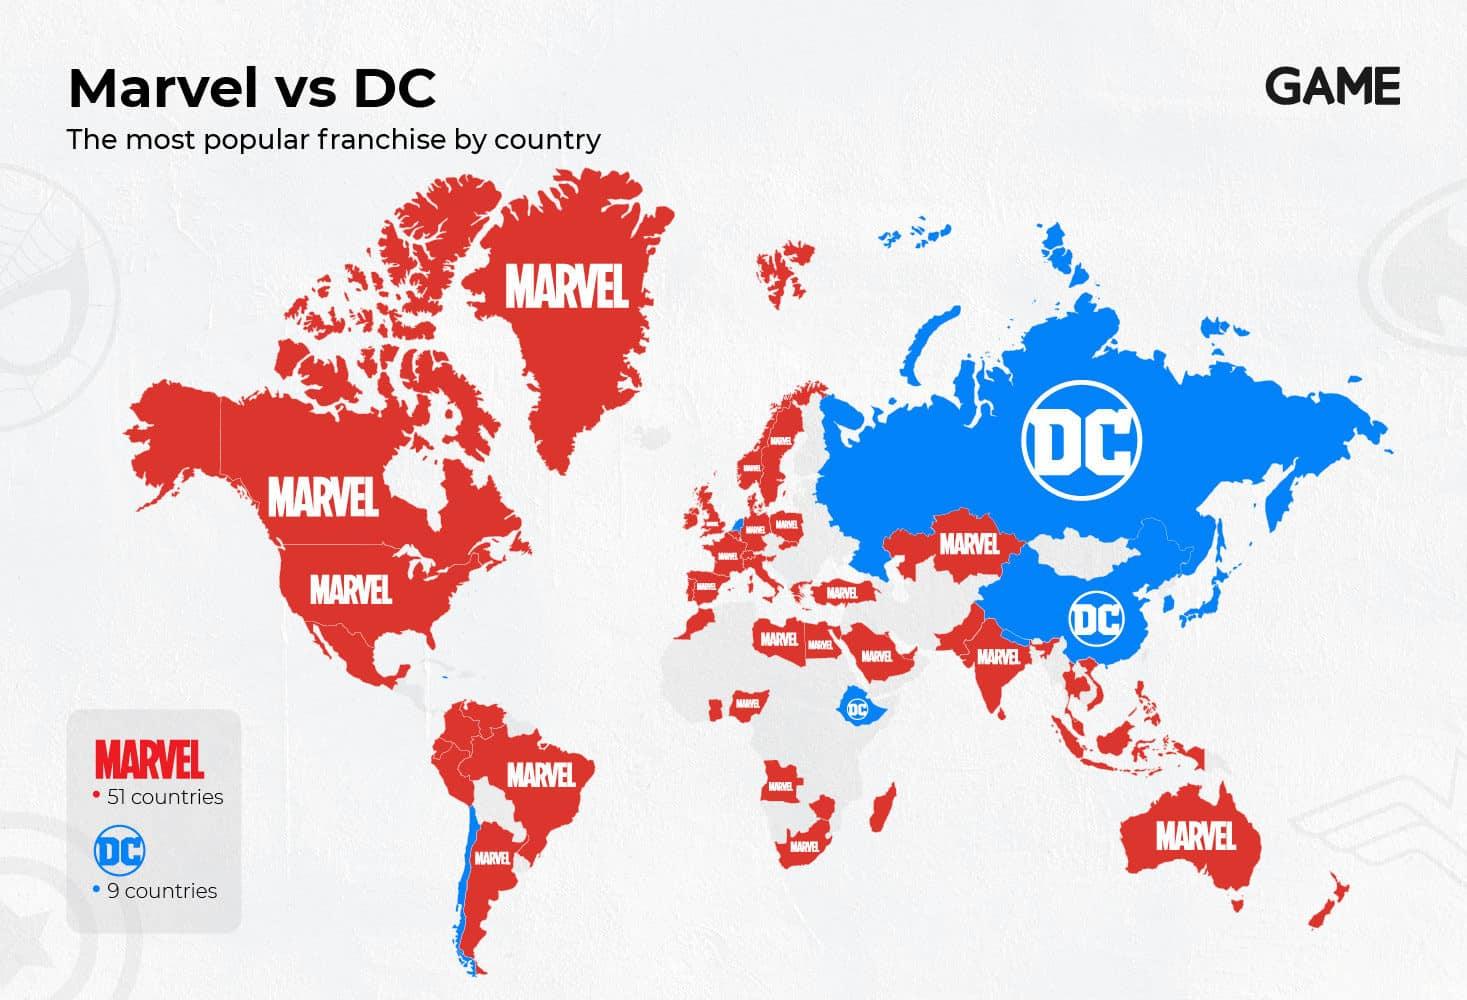 ¡Marvel gana!